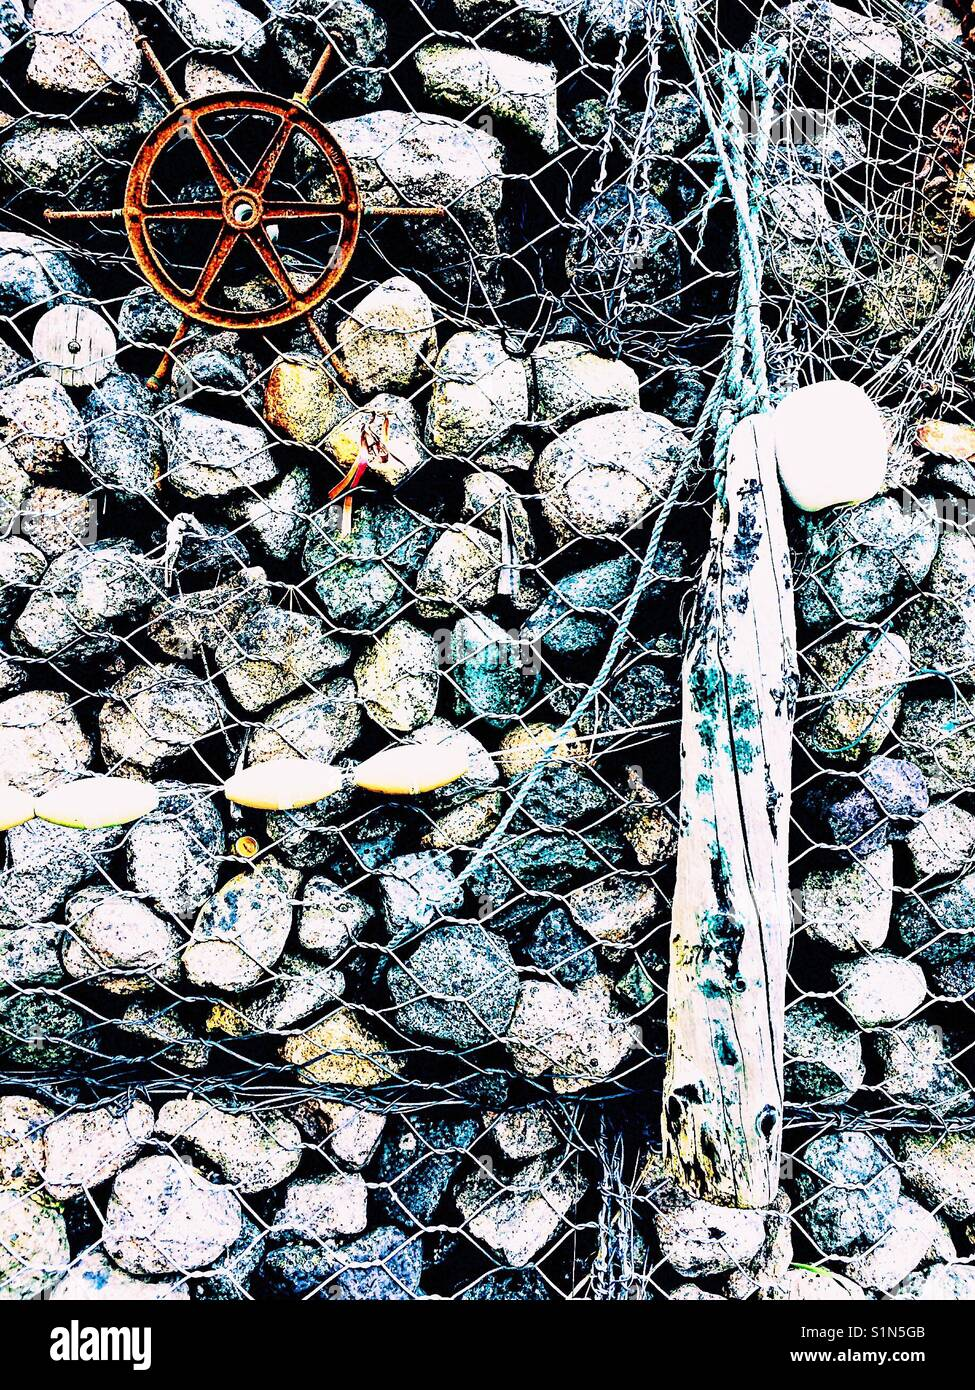 Maschendraht Gabionen Wand Stockfoto, Bild: 310866651 - Alamy